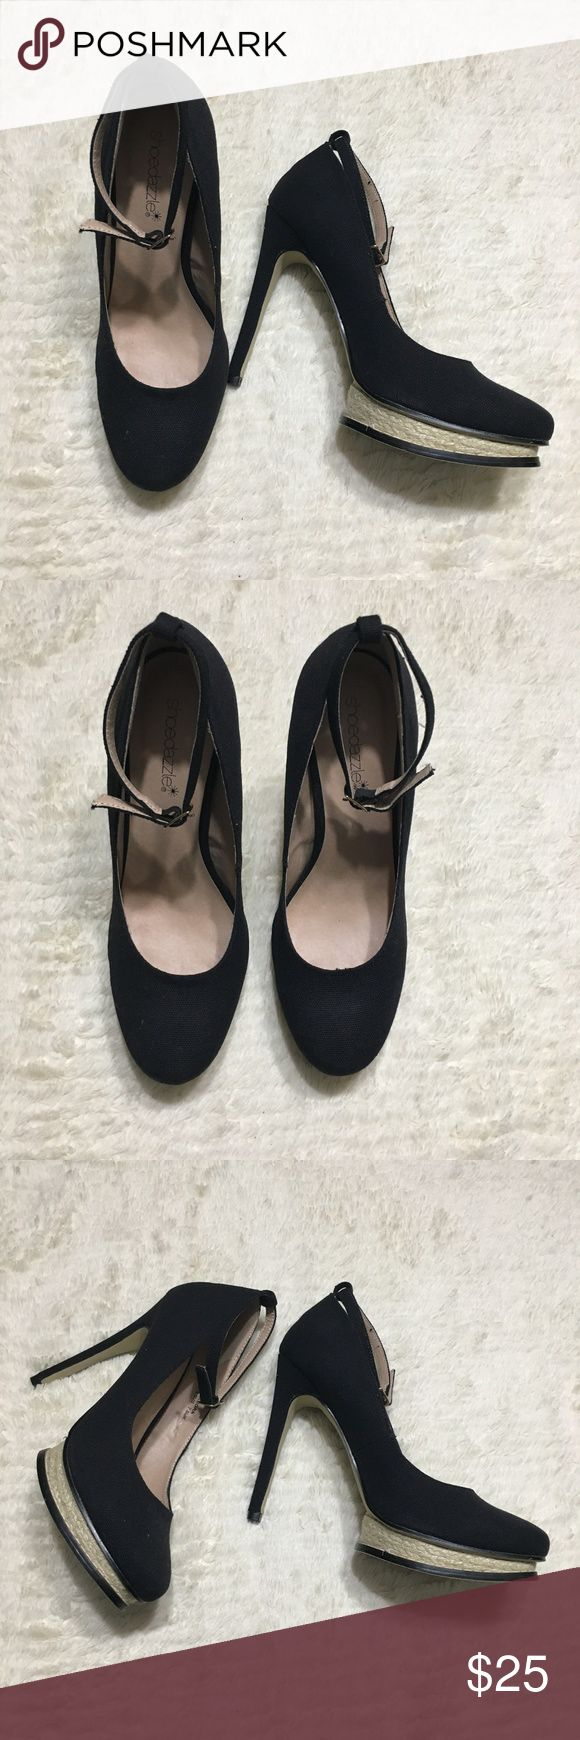 "NWOB Shoe Dazzle Allegra Black Heels NWOB: Wear on bottoms from trying on only.  Platform pump with ankle strap and espadrille platform  FIT: True to size COLOR: Black HEEL HEIGHT: 5"" heel* PLATFORM: 1"" platform* Shoe Dazzle Shoes Heels"